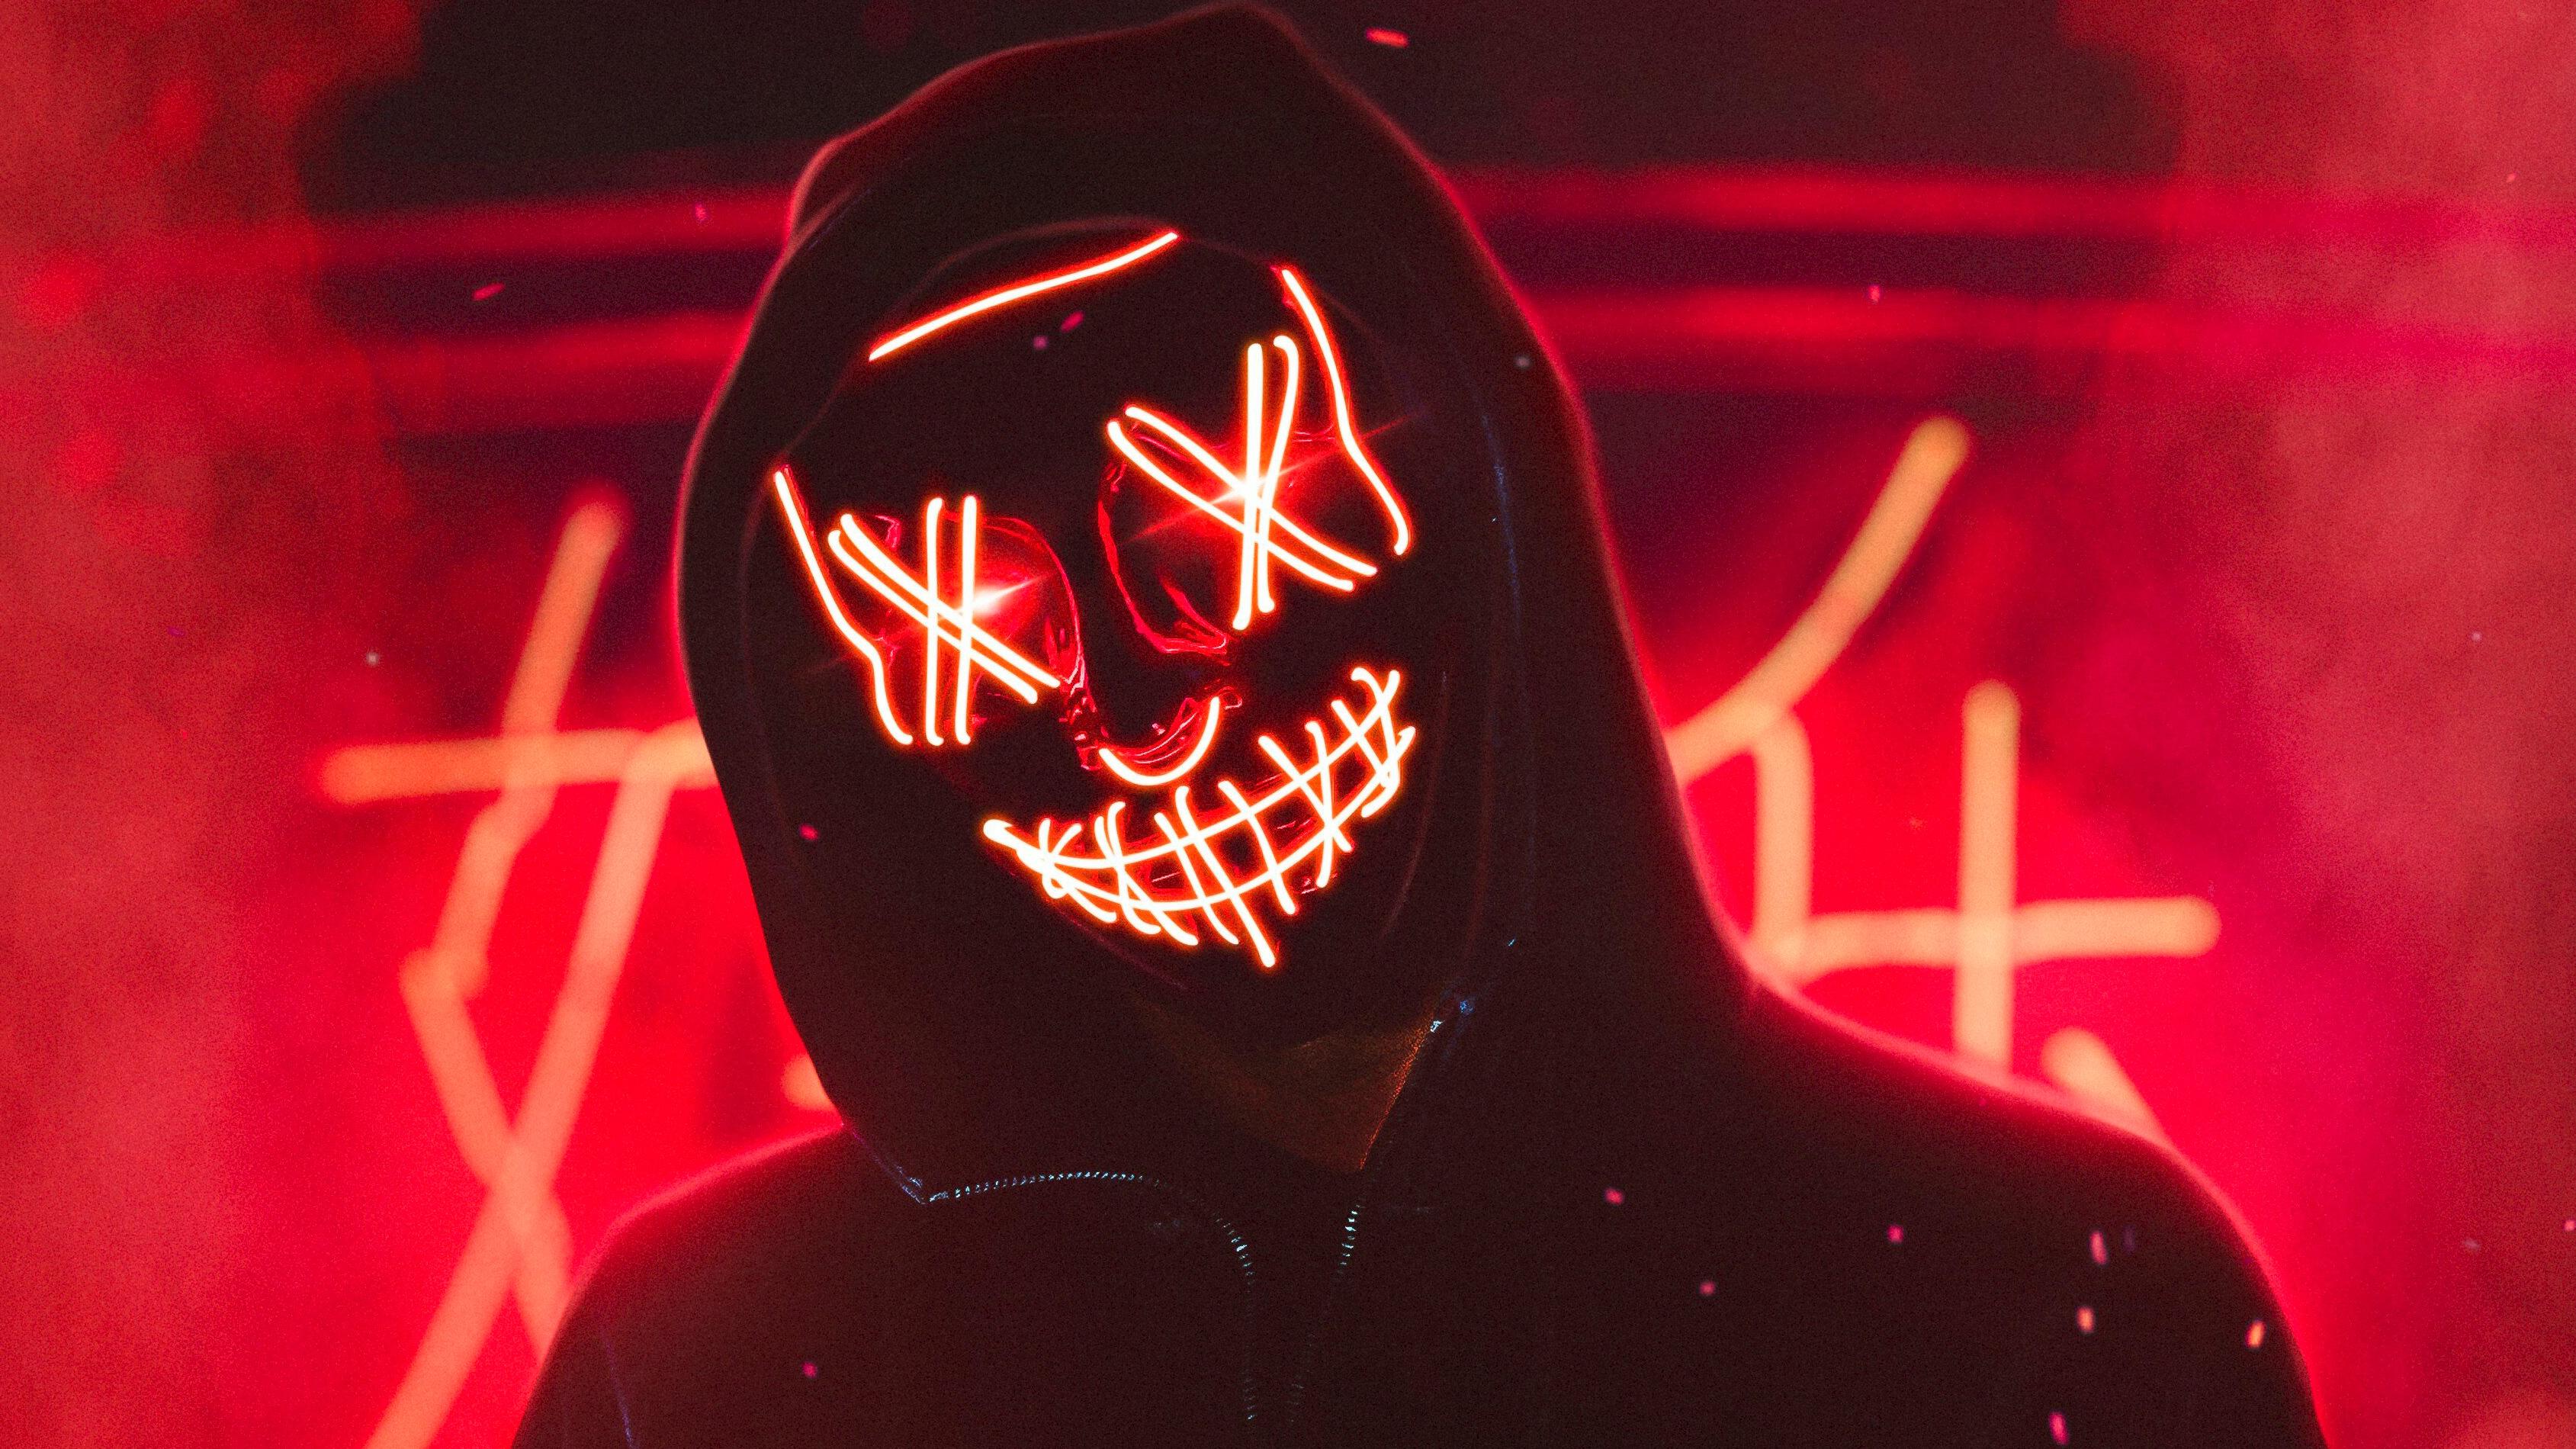 Neon Mask Guy 4k Hd Artist 4k Wallpapers Images